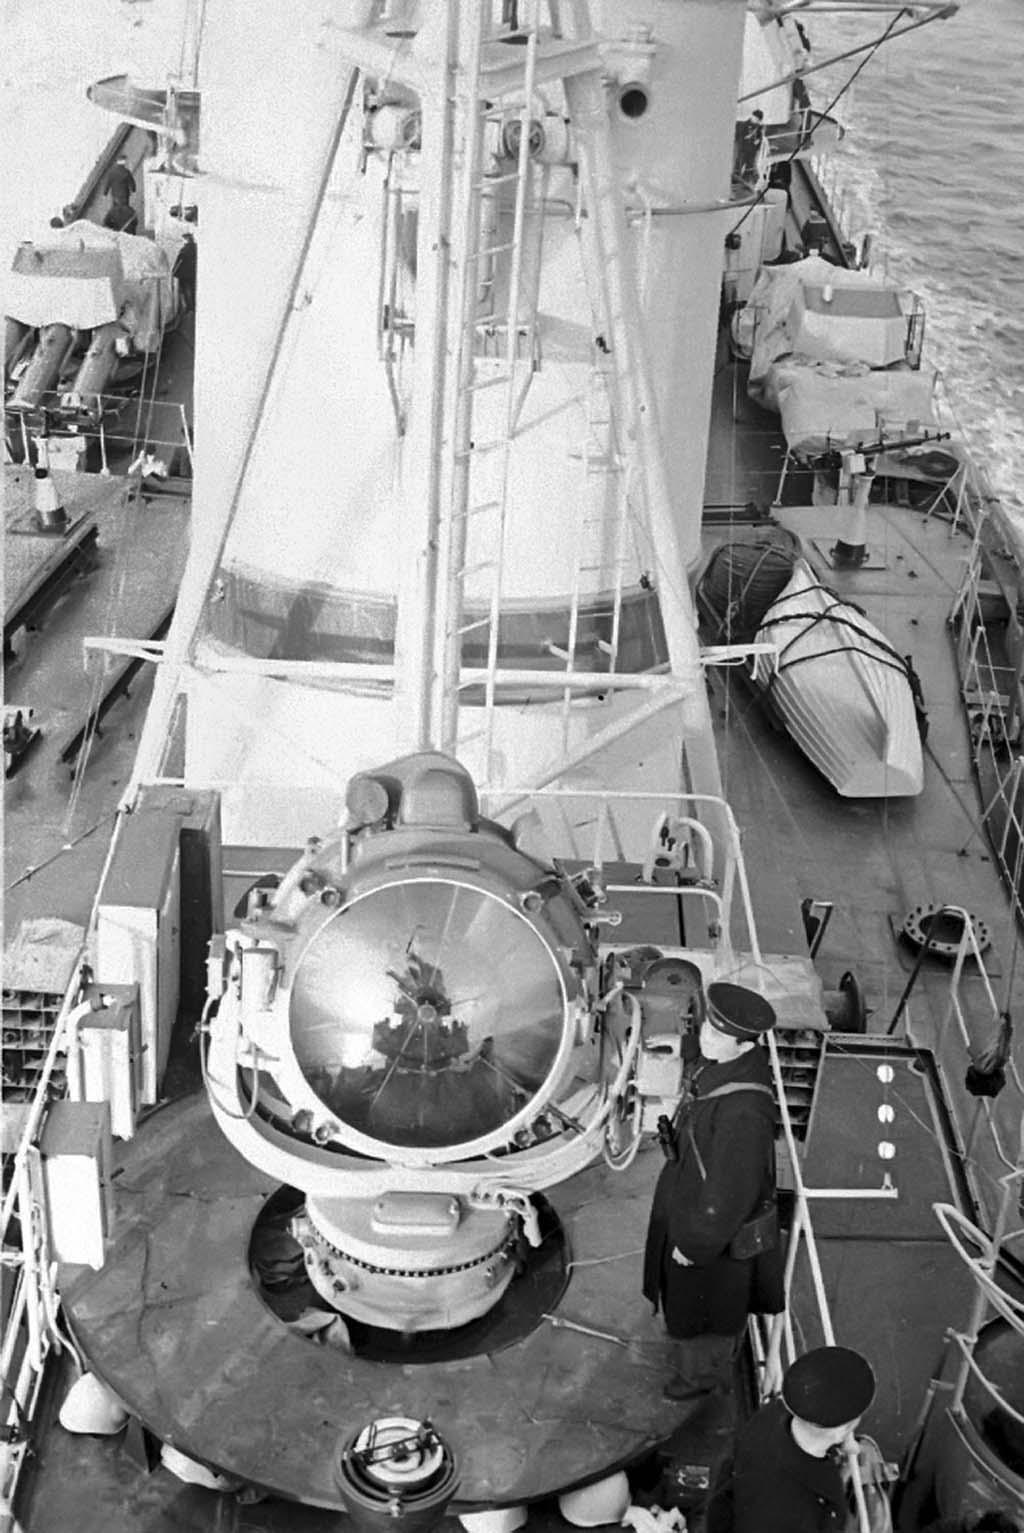 Molotov cruiser